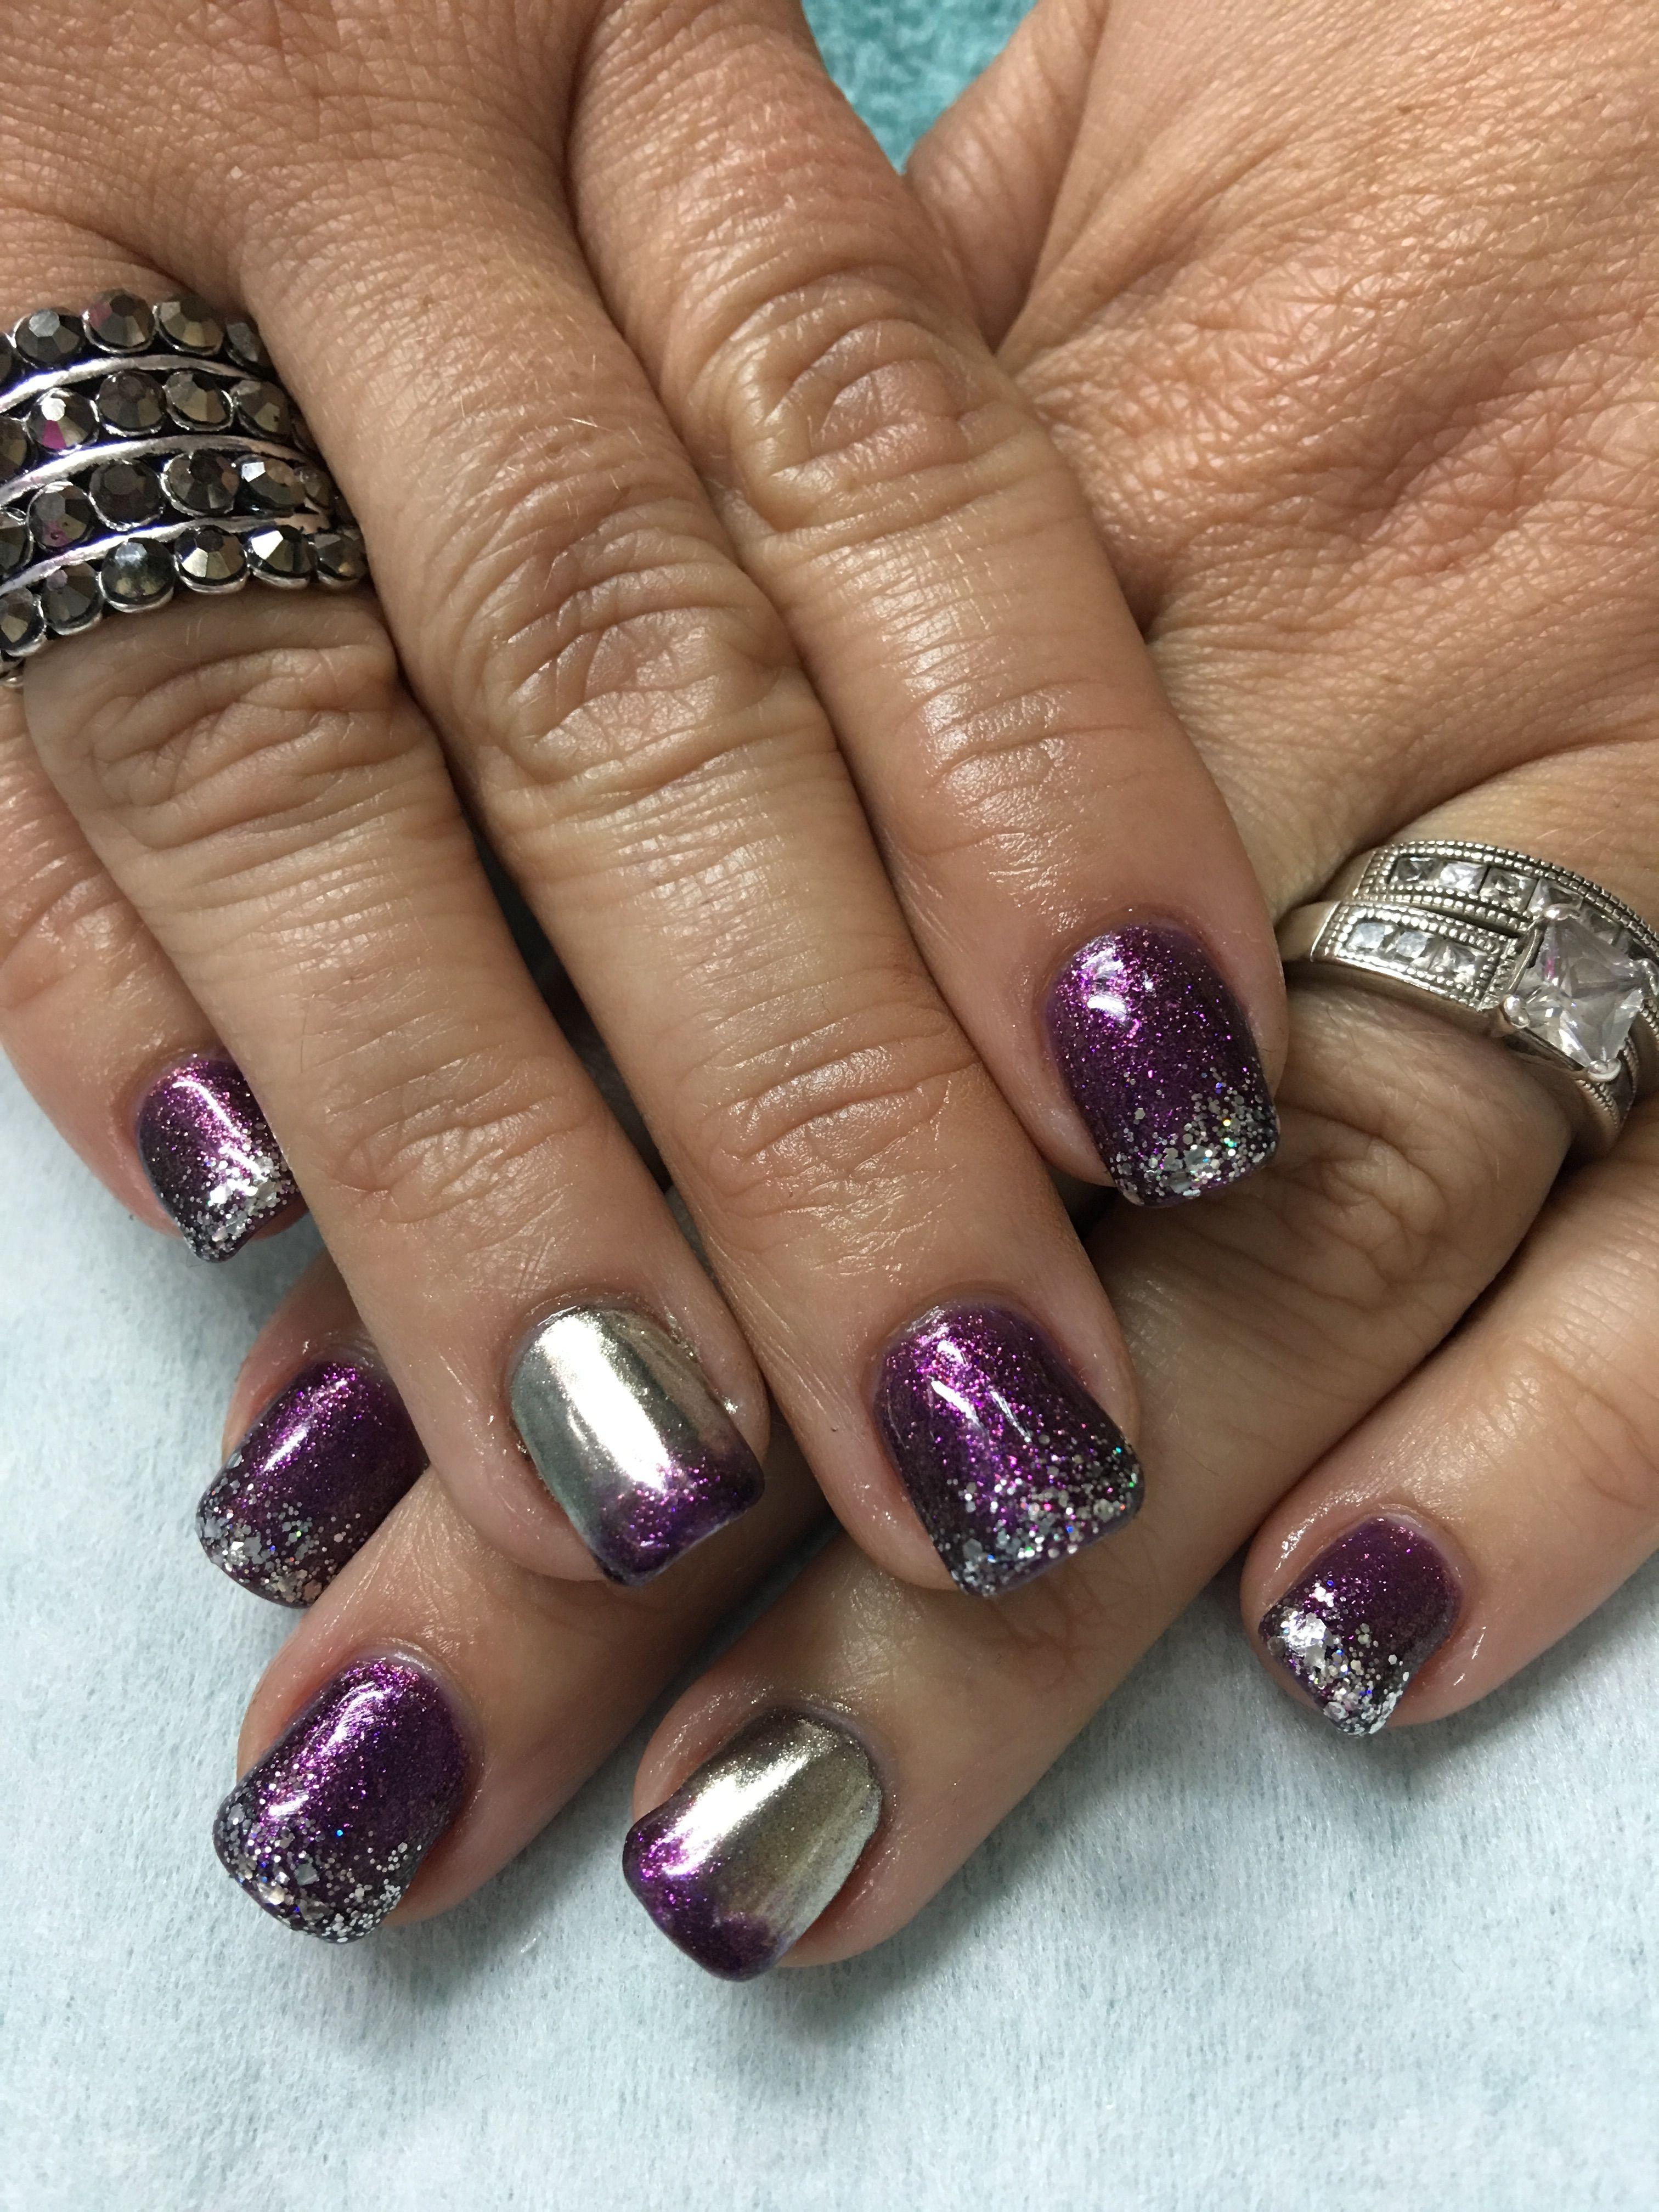 Fall Purple Big Bling Silver Chrome Gel Nails Fall Nail Designs Nail Designs Gel Nail Designs